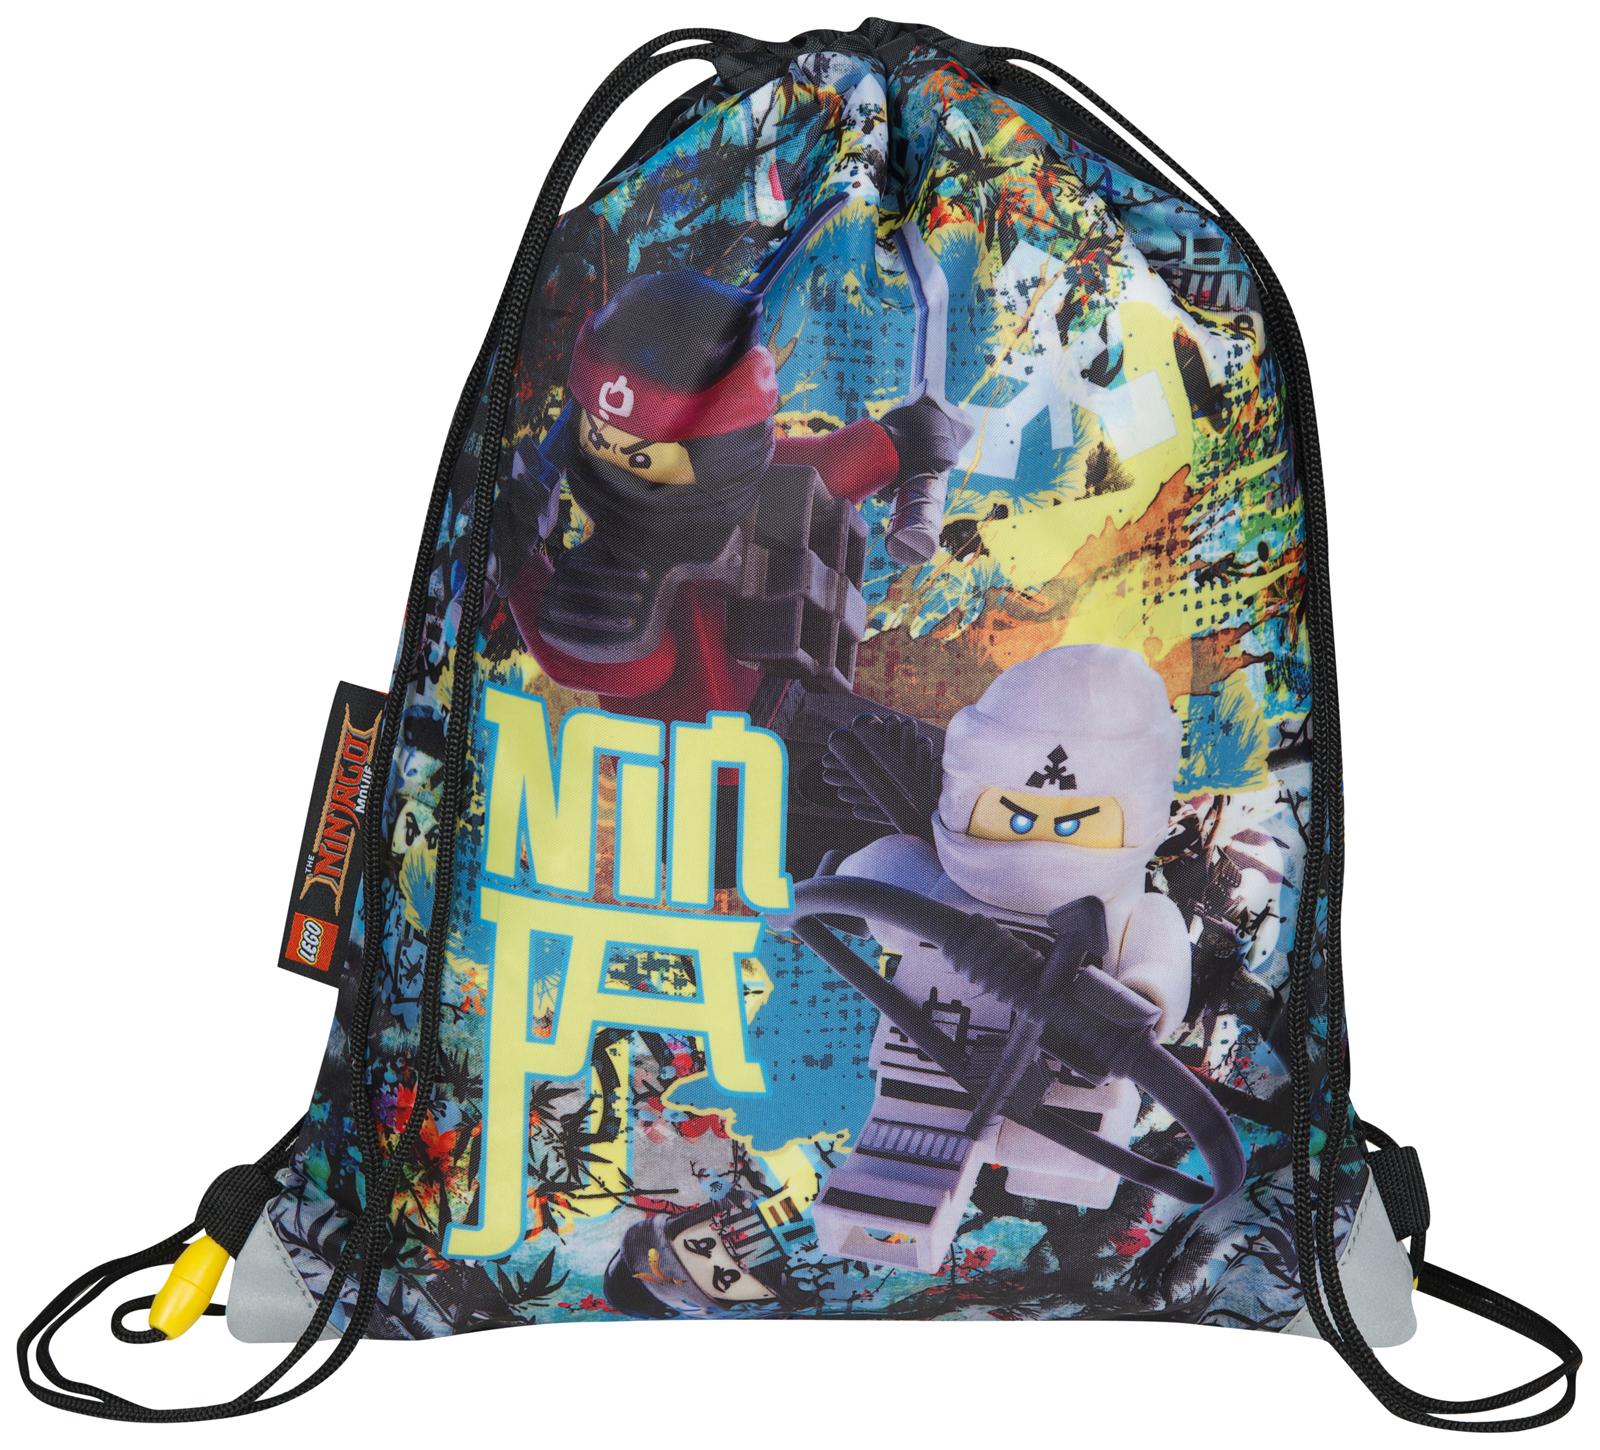 Kids-Character-Swimming-Bag-Gym-Bag-Pump-Bag-Sports-School-Drawstring-Boys-Girls